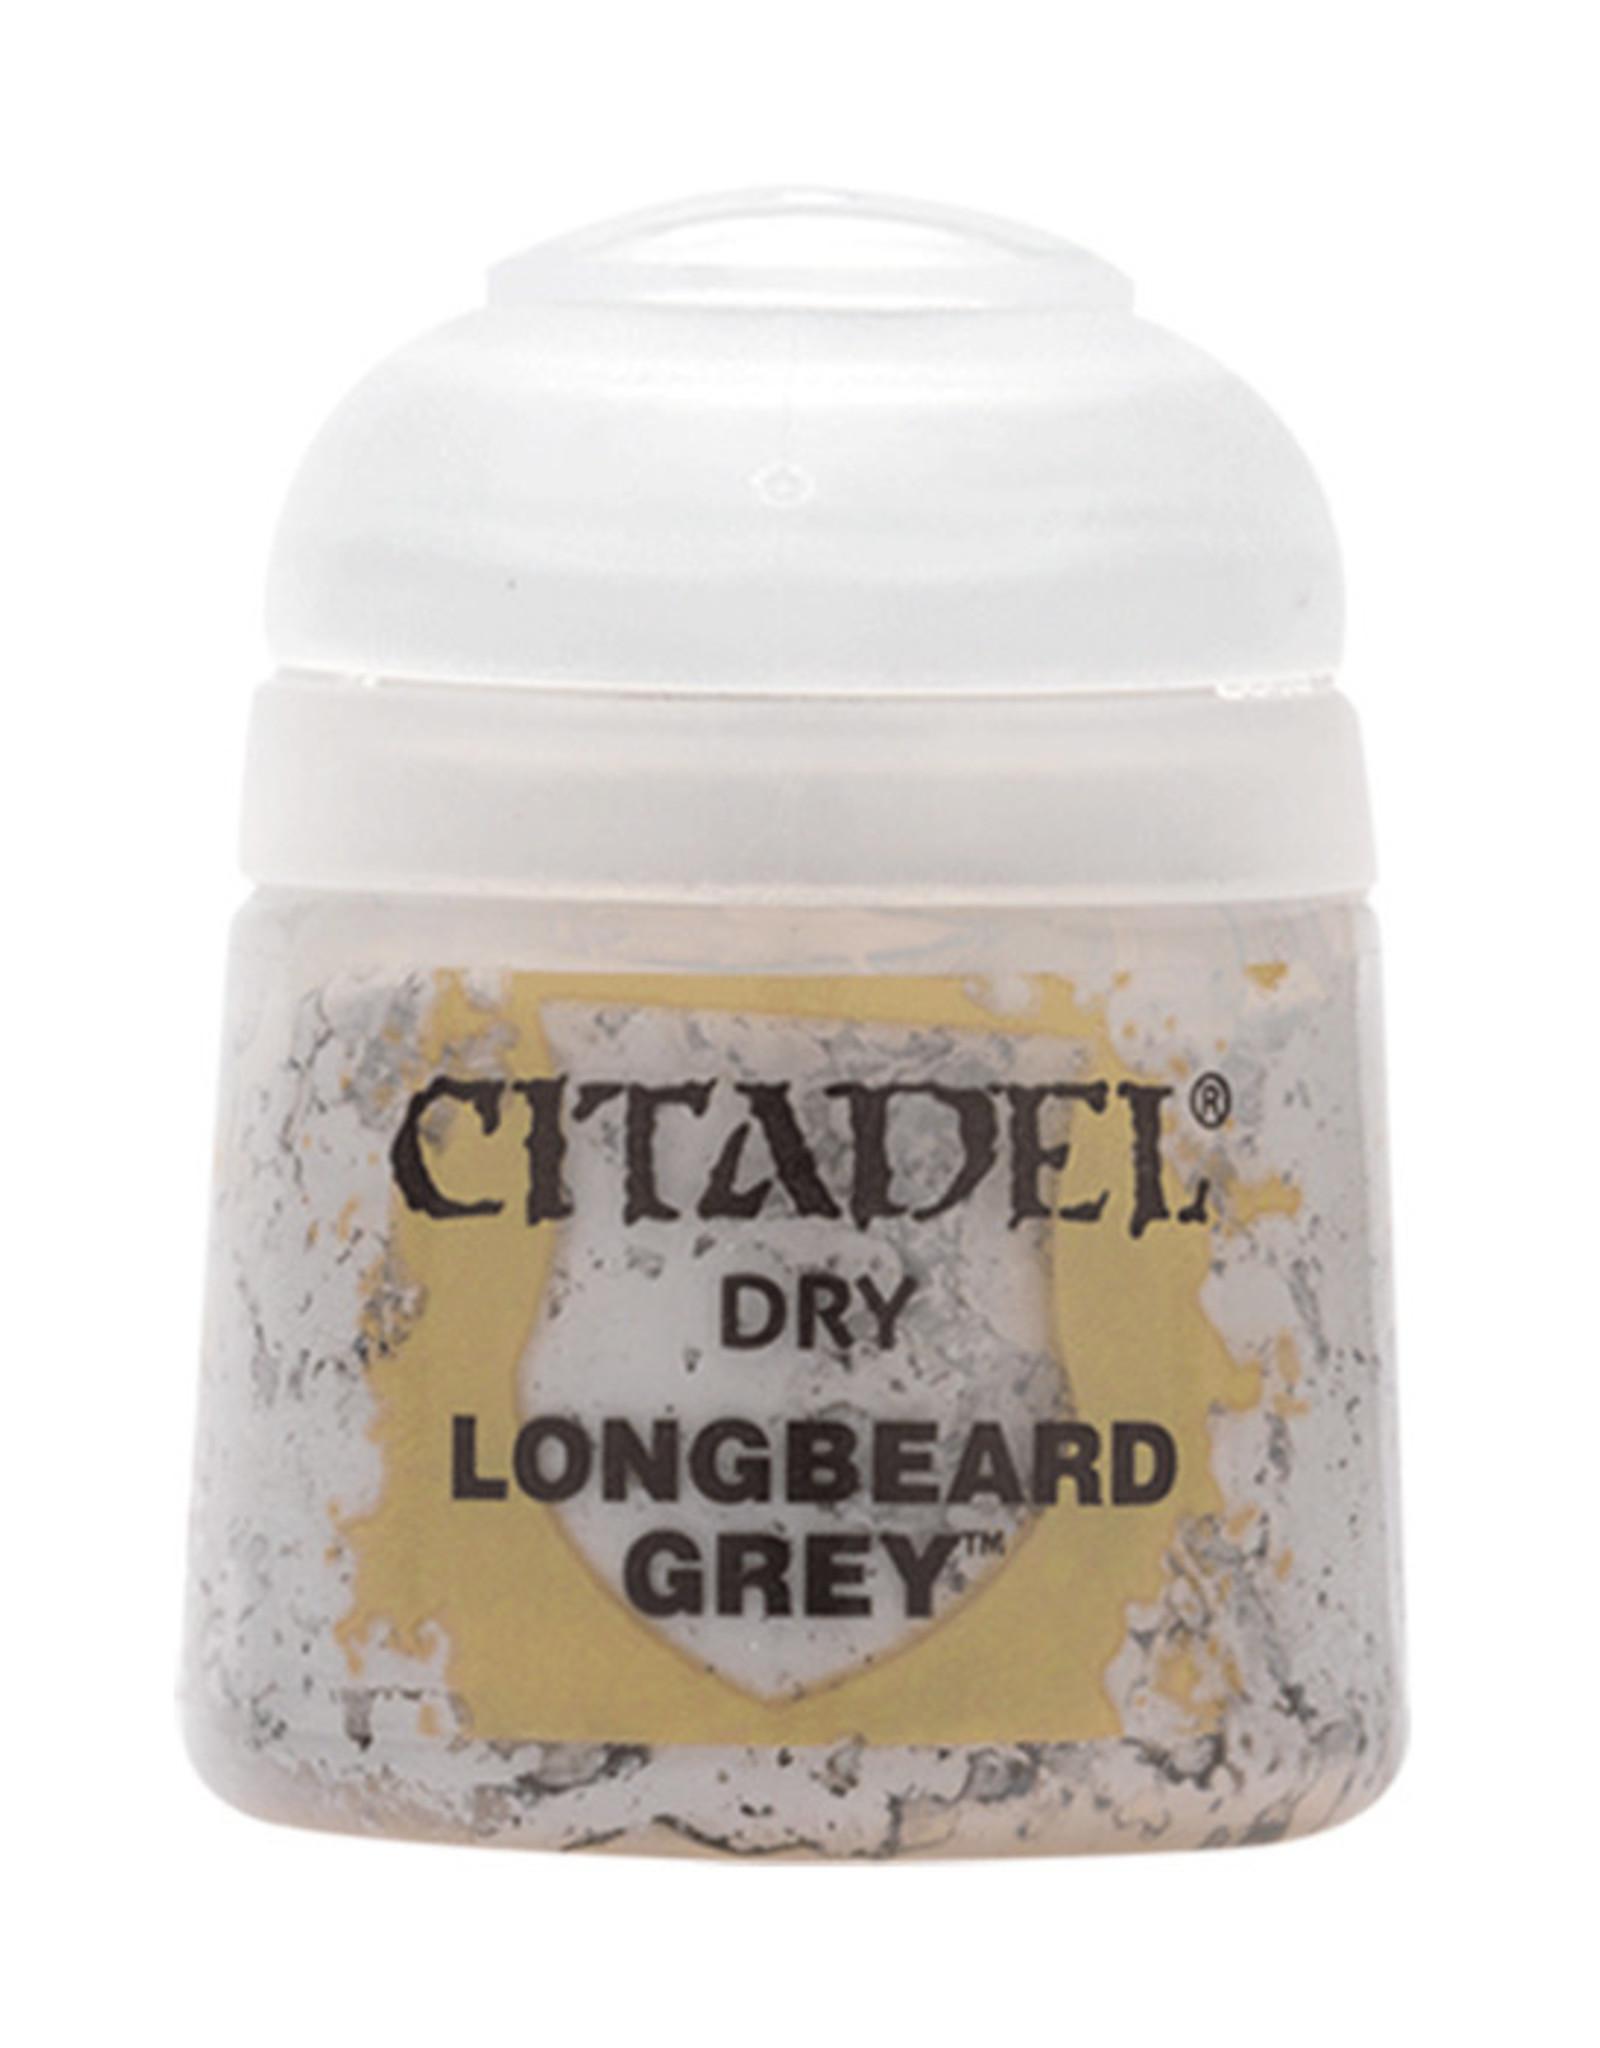 Citadel Citadel Colour: Dry - Longbeard Grey